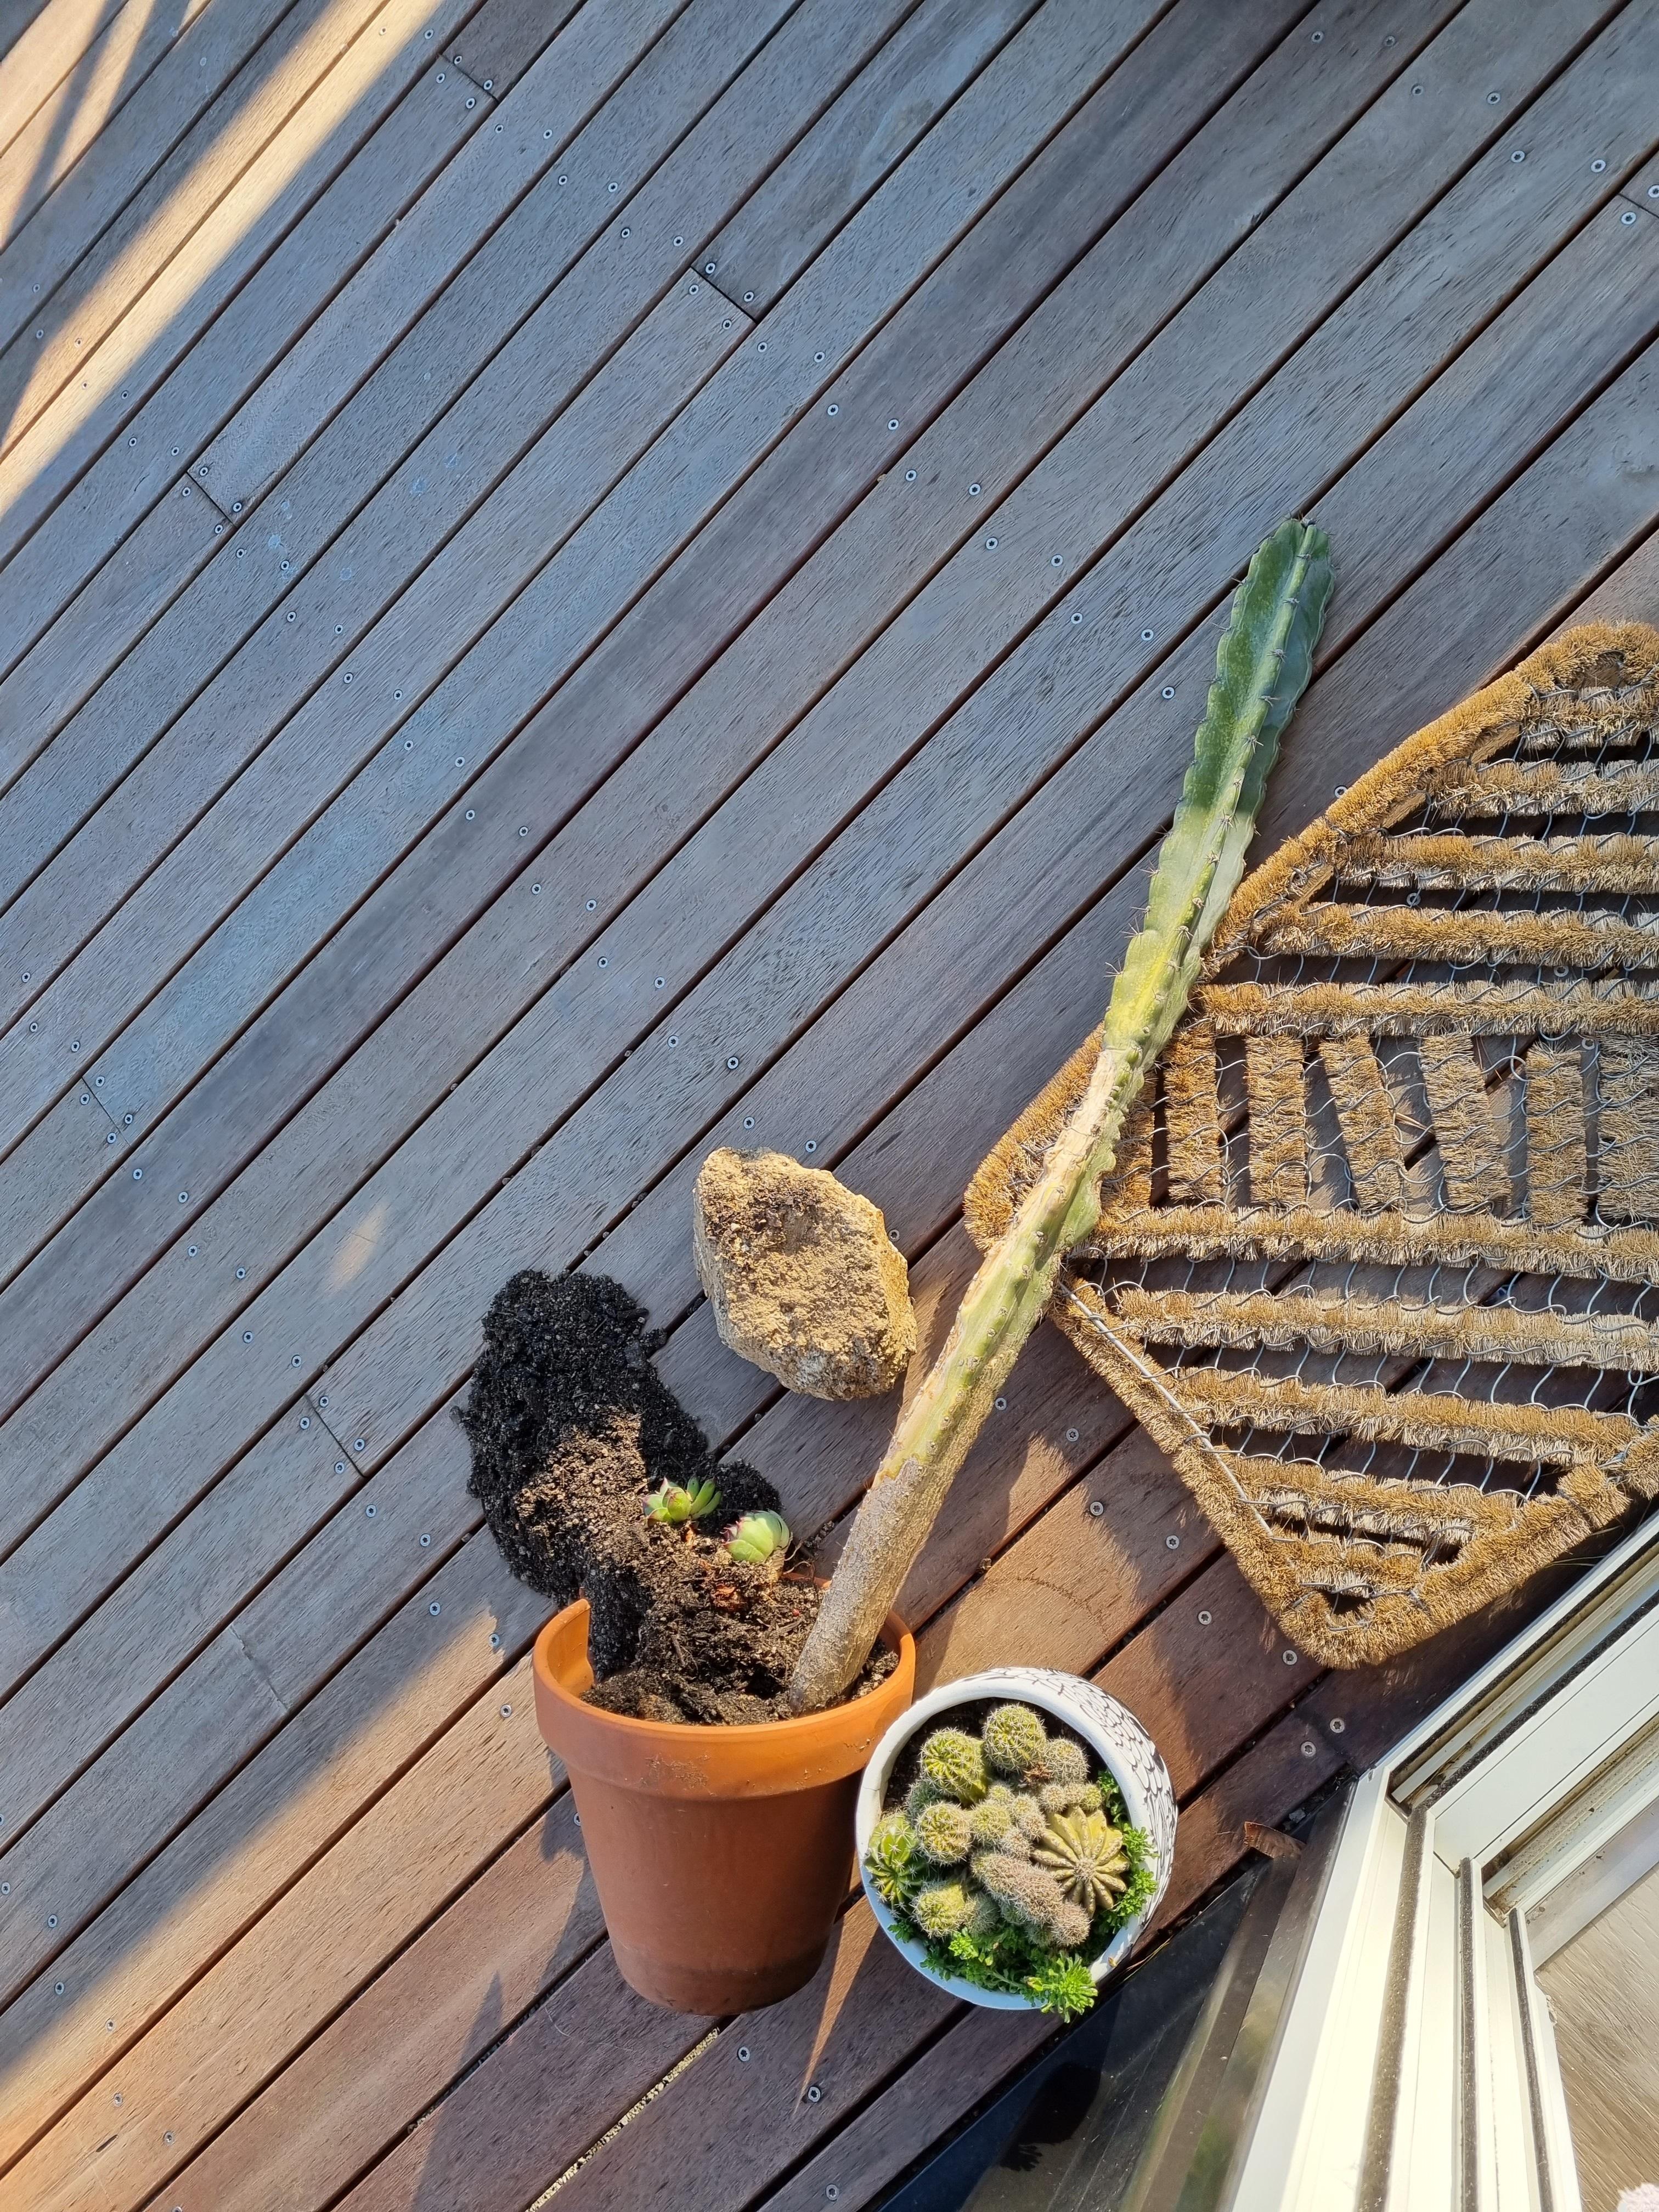 My cactus is cactus.jpg